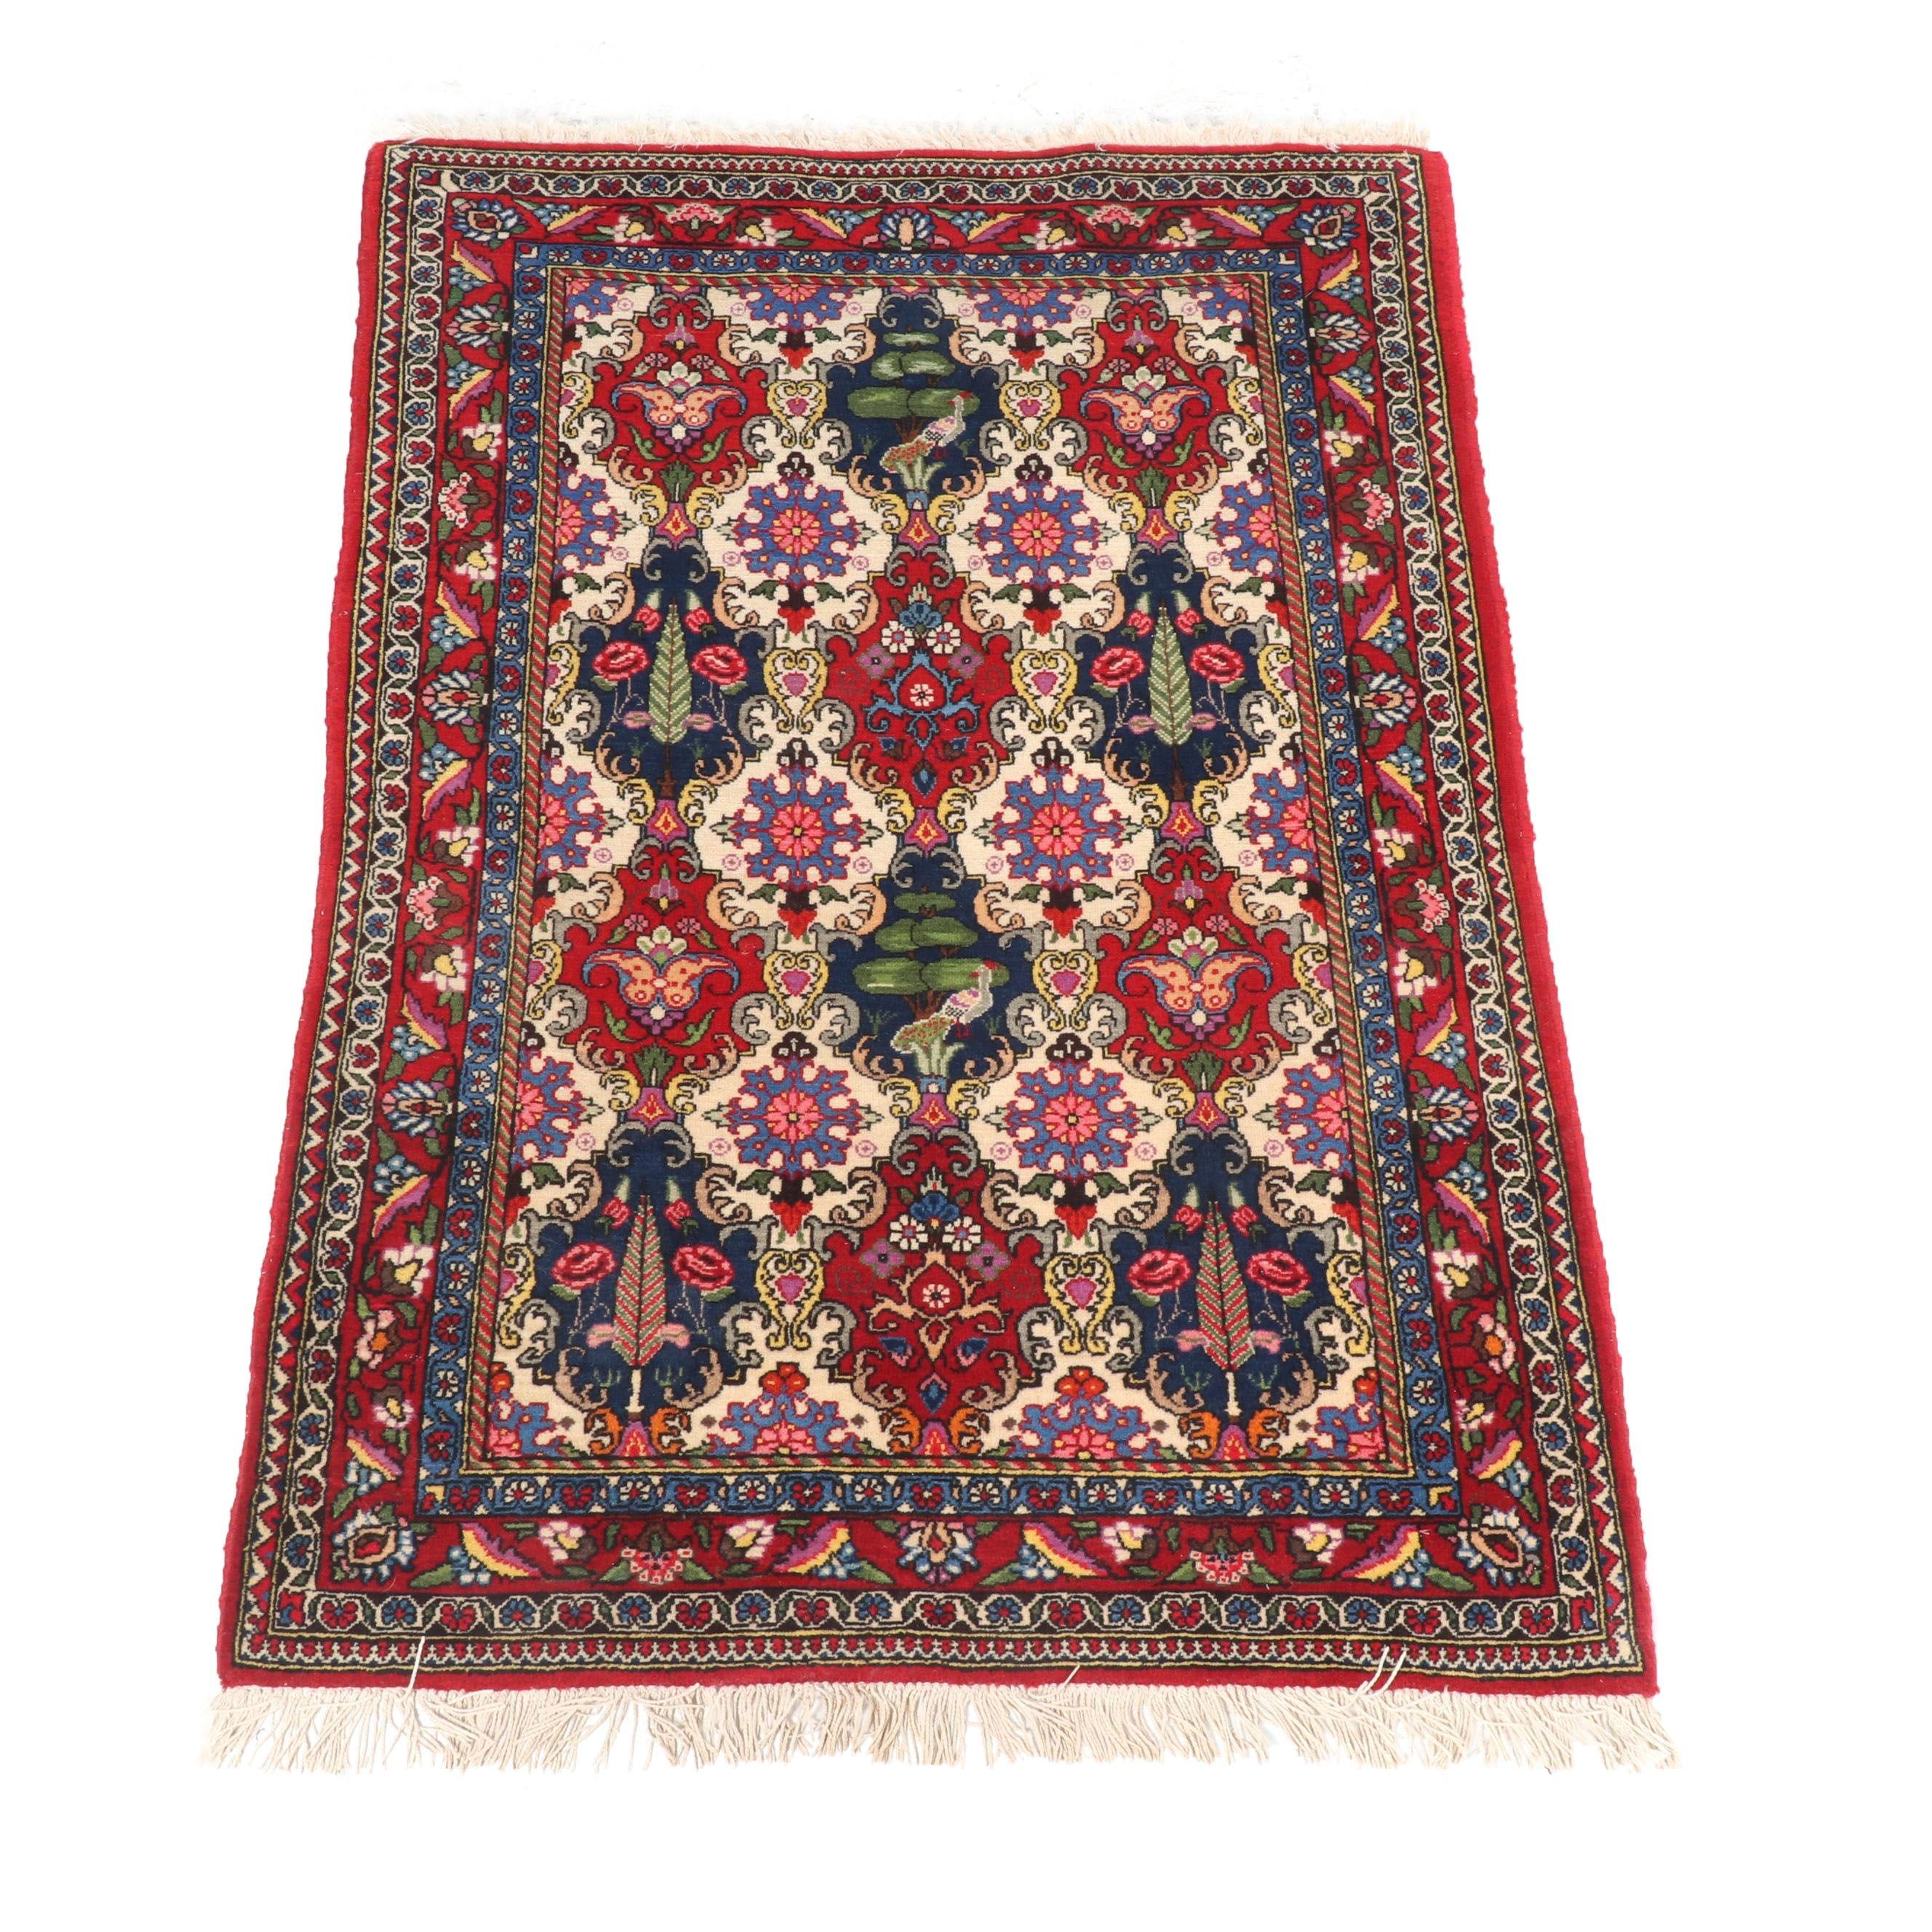 Hand-Knotted Persian Bakhtiari Wool Rug